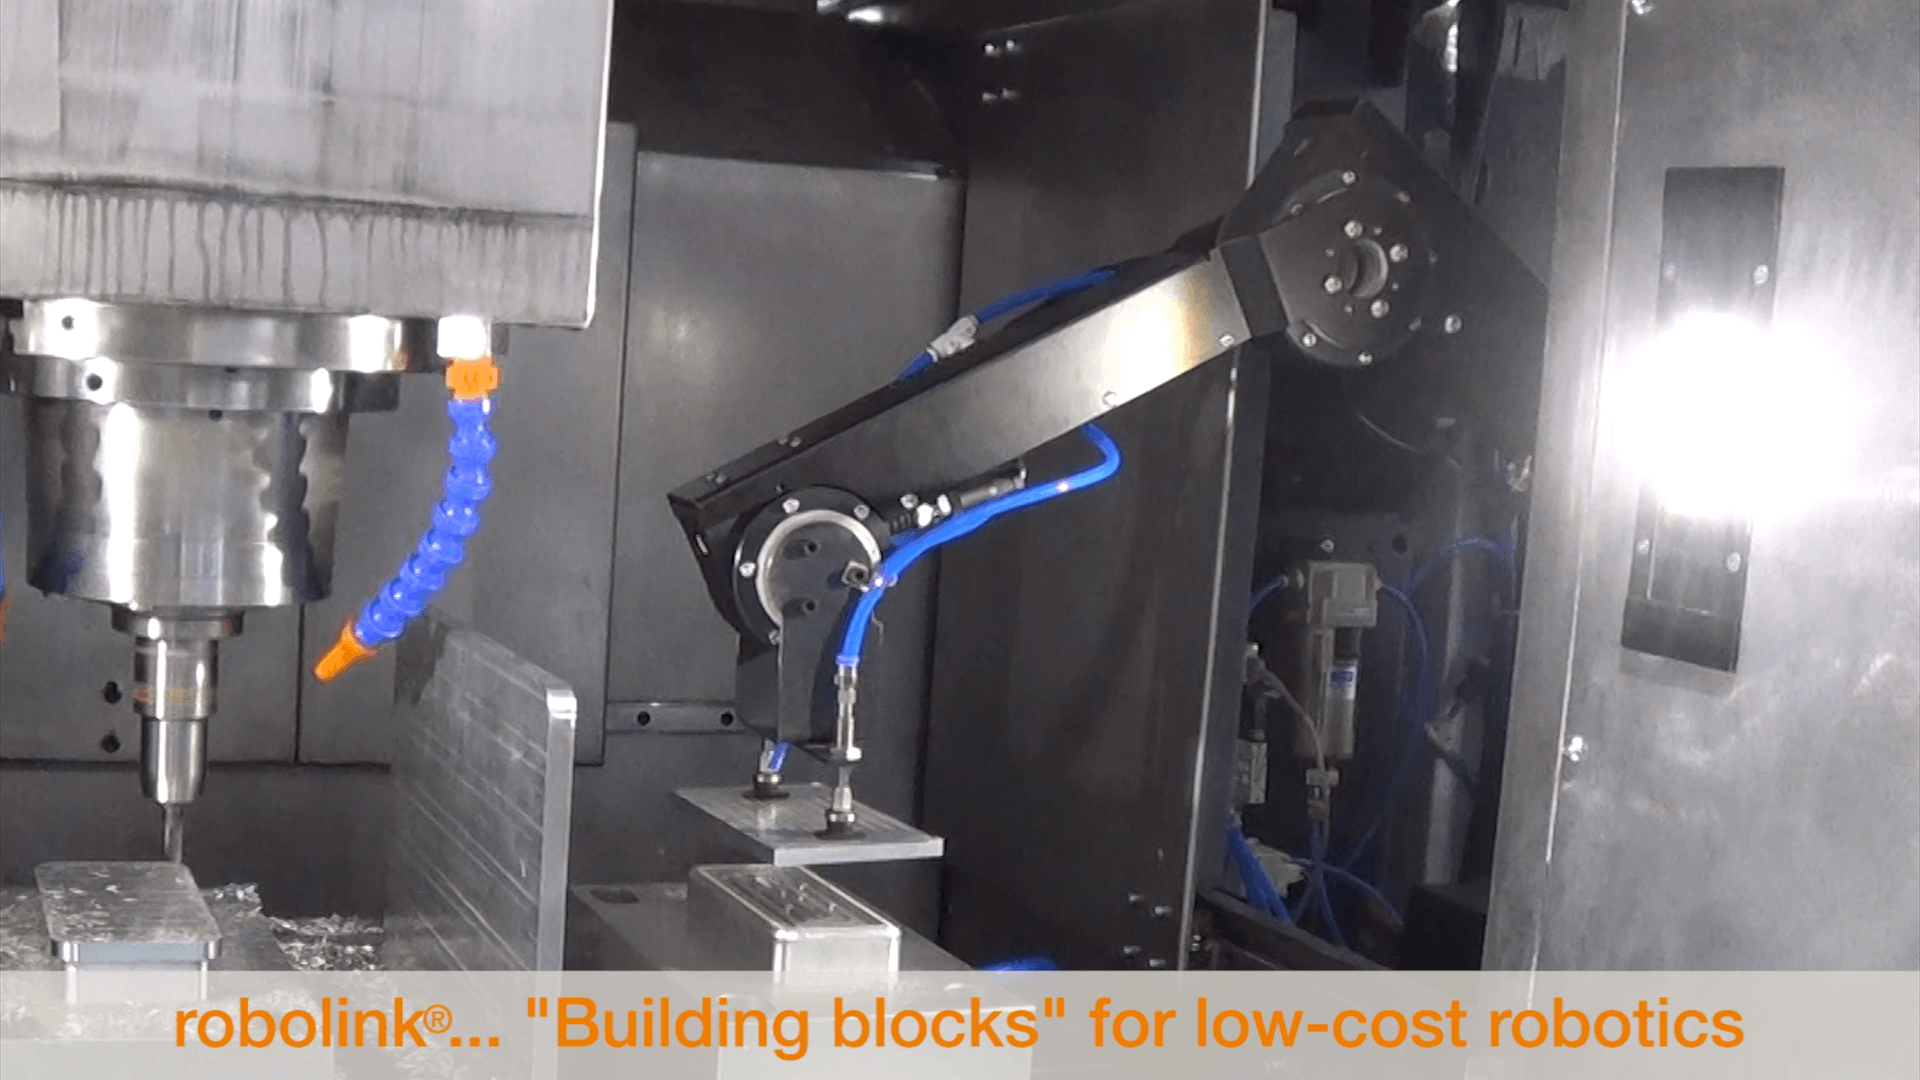 Igus Robolink For Building Low Cost Robots Parker Electromechanical Automation Faq Site Servo Motors